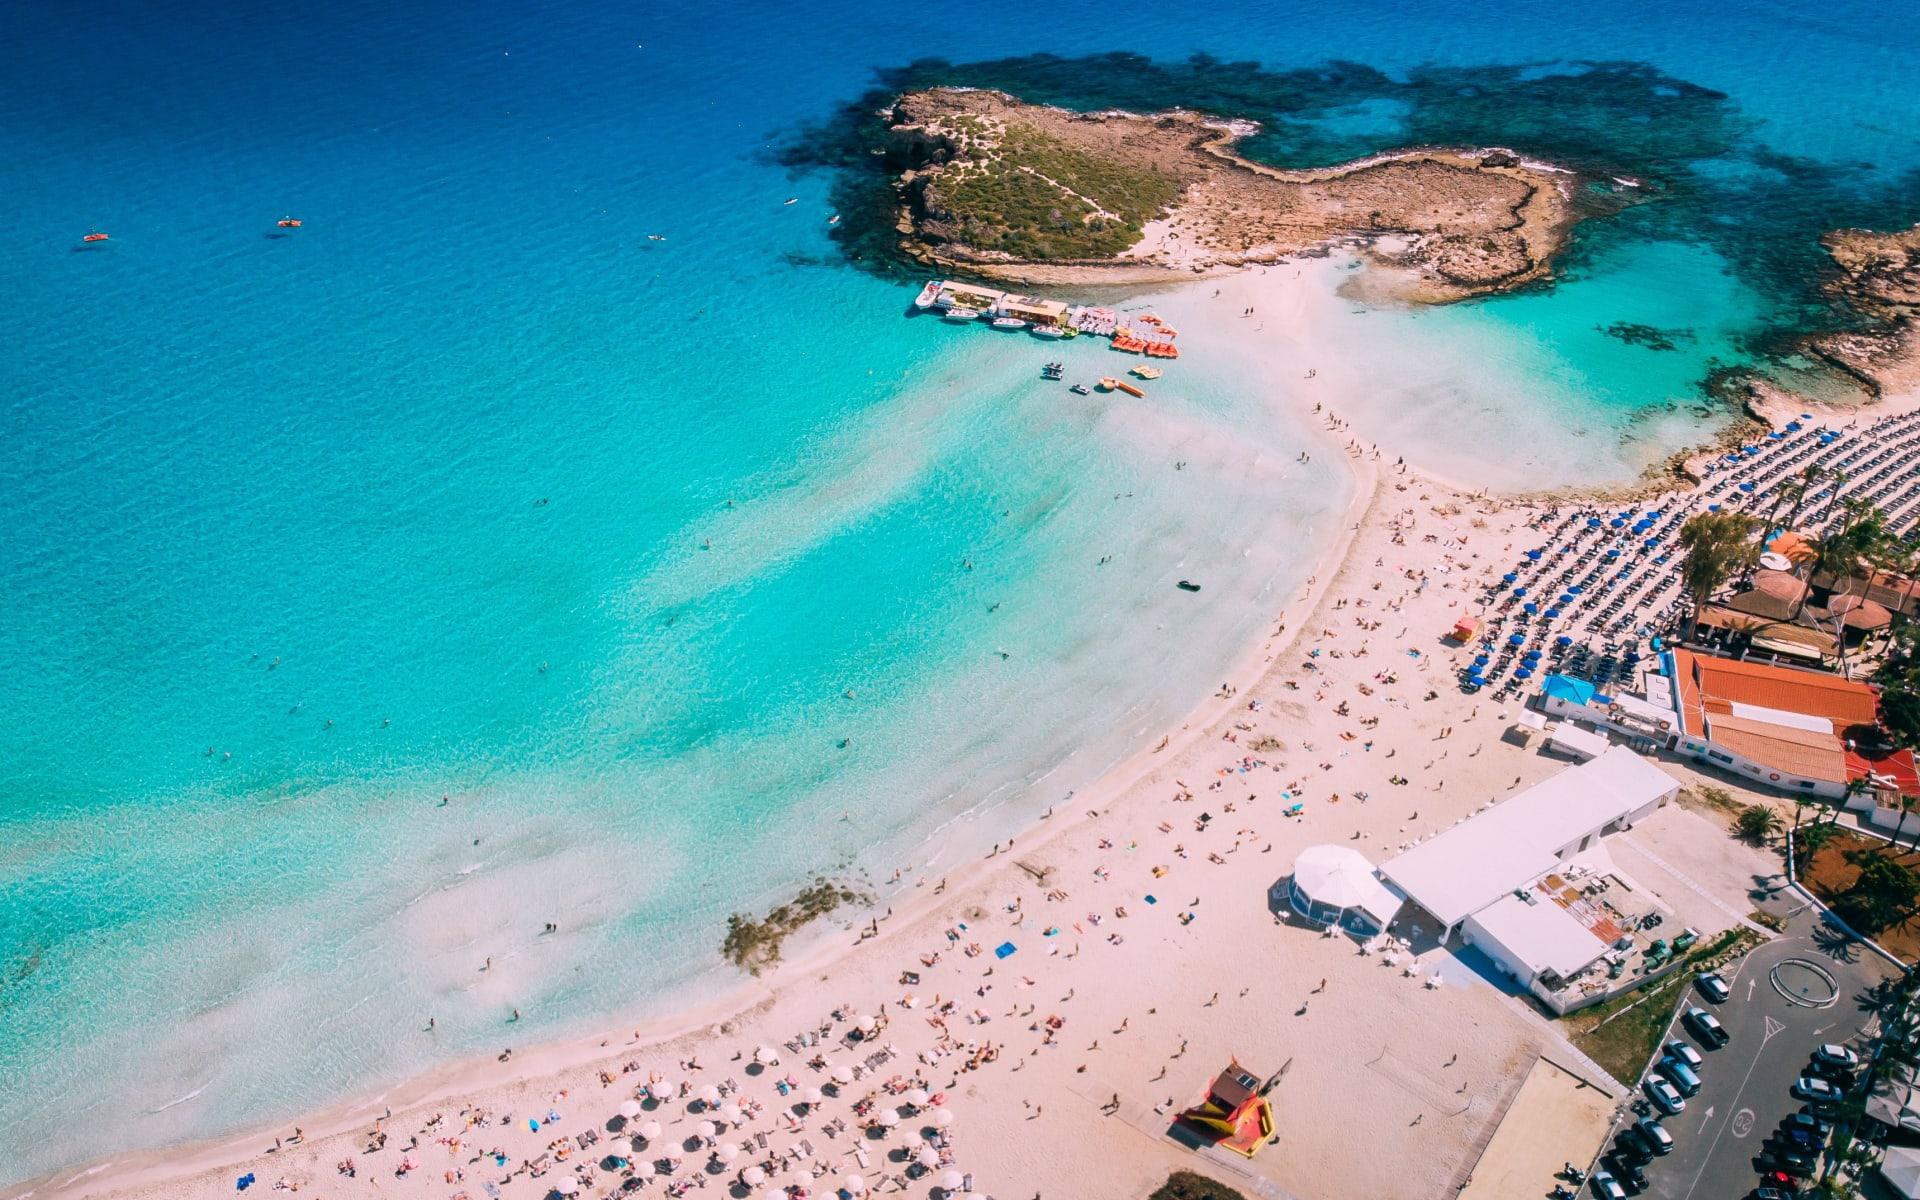 Badeferien im Napa Mermaid Hotel & Suites ab Aya Napa: Ayia_Napa_Nissi_Beach_